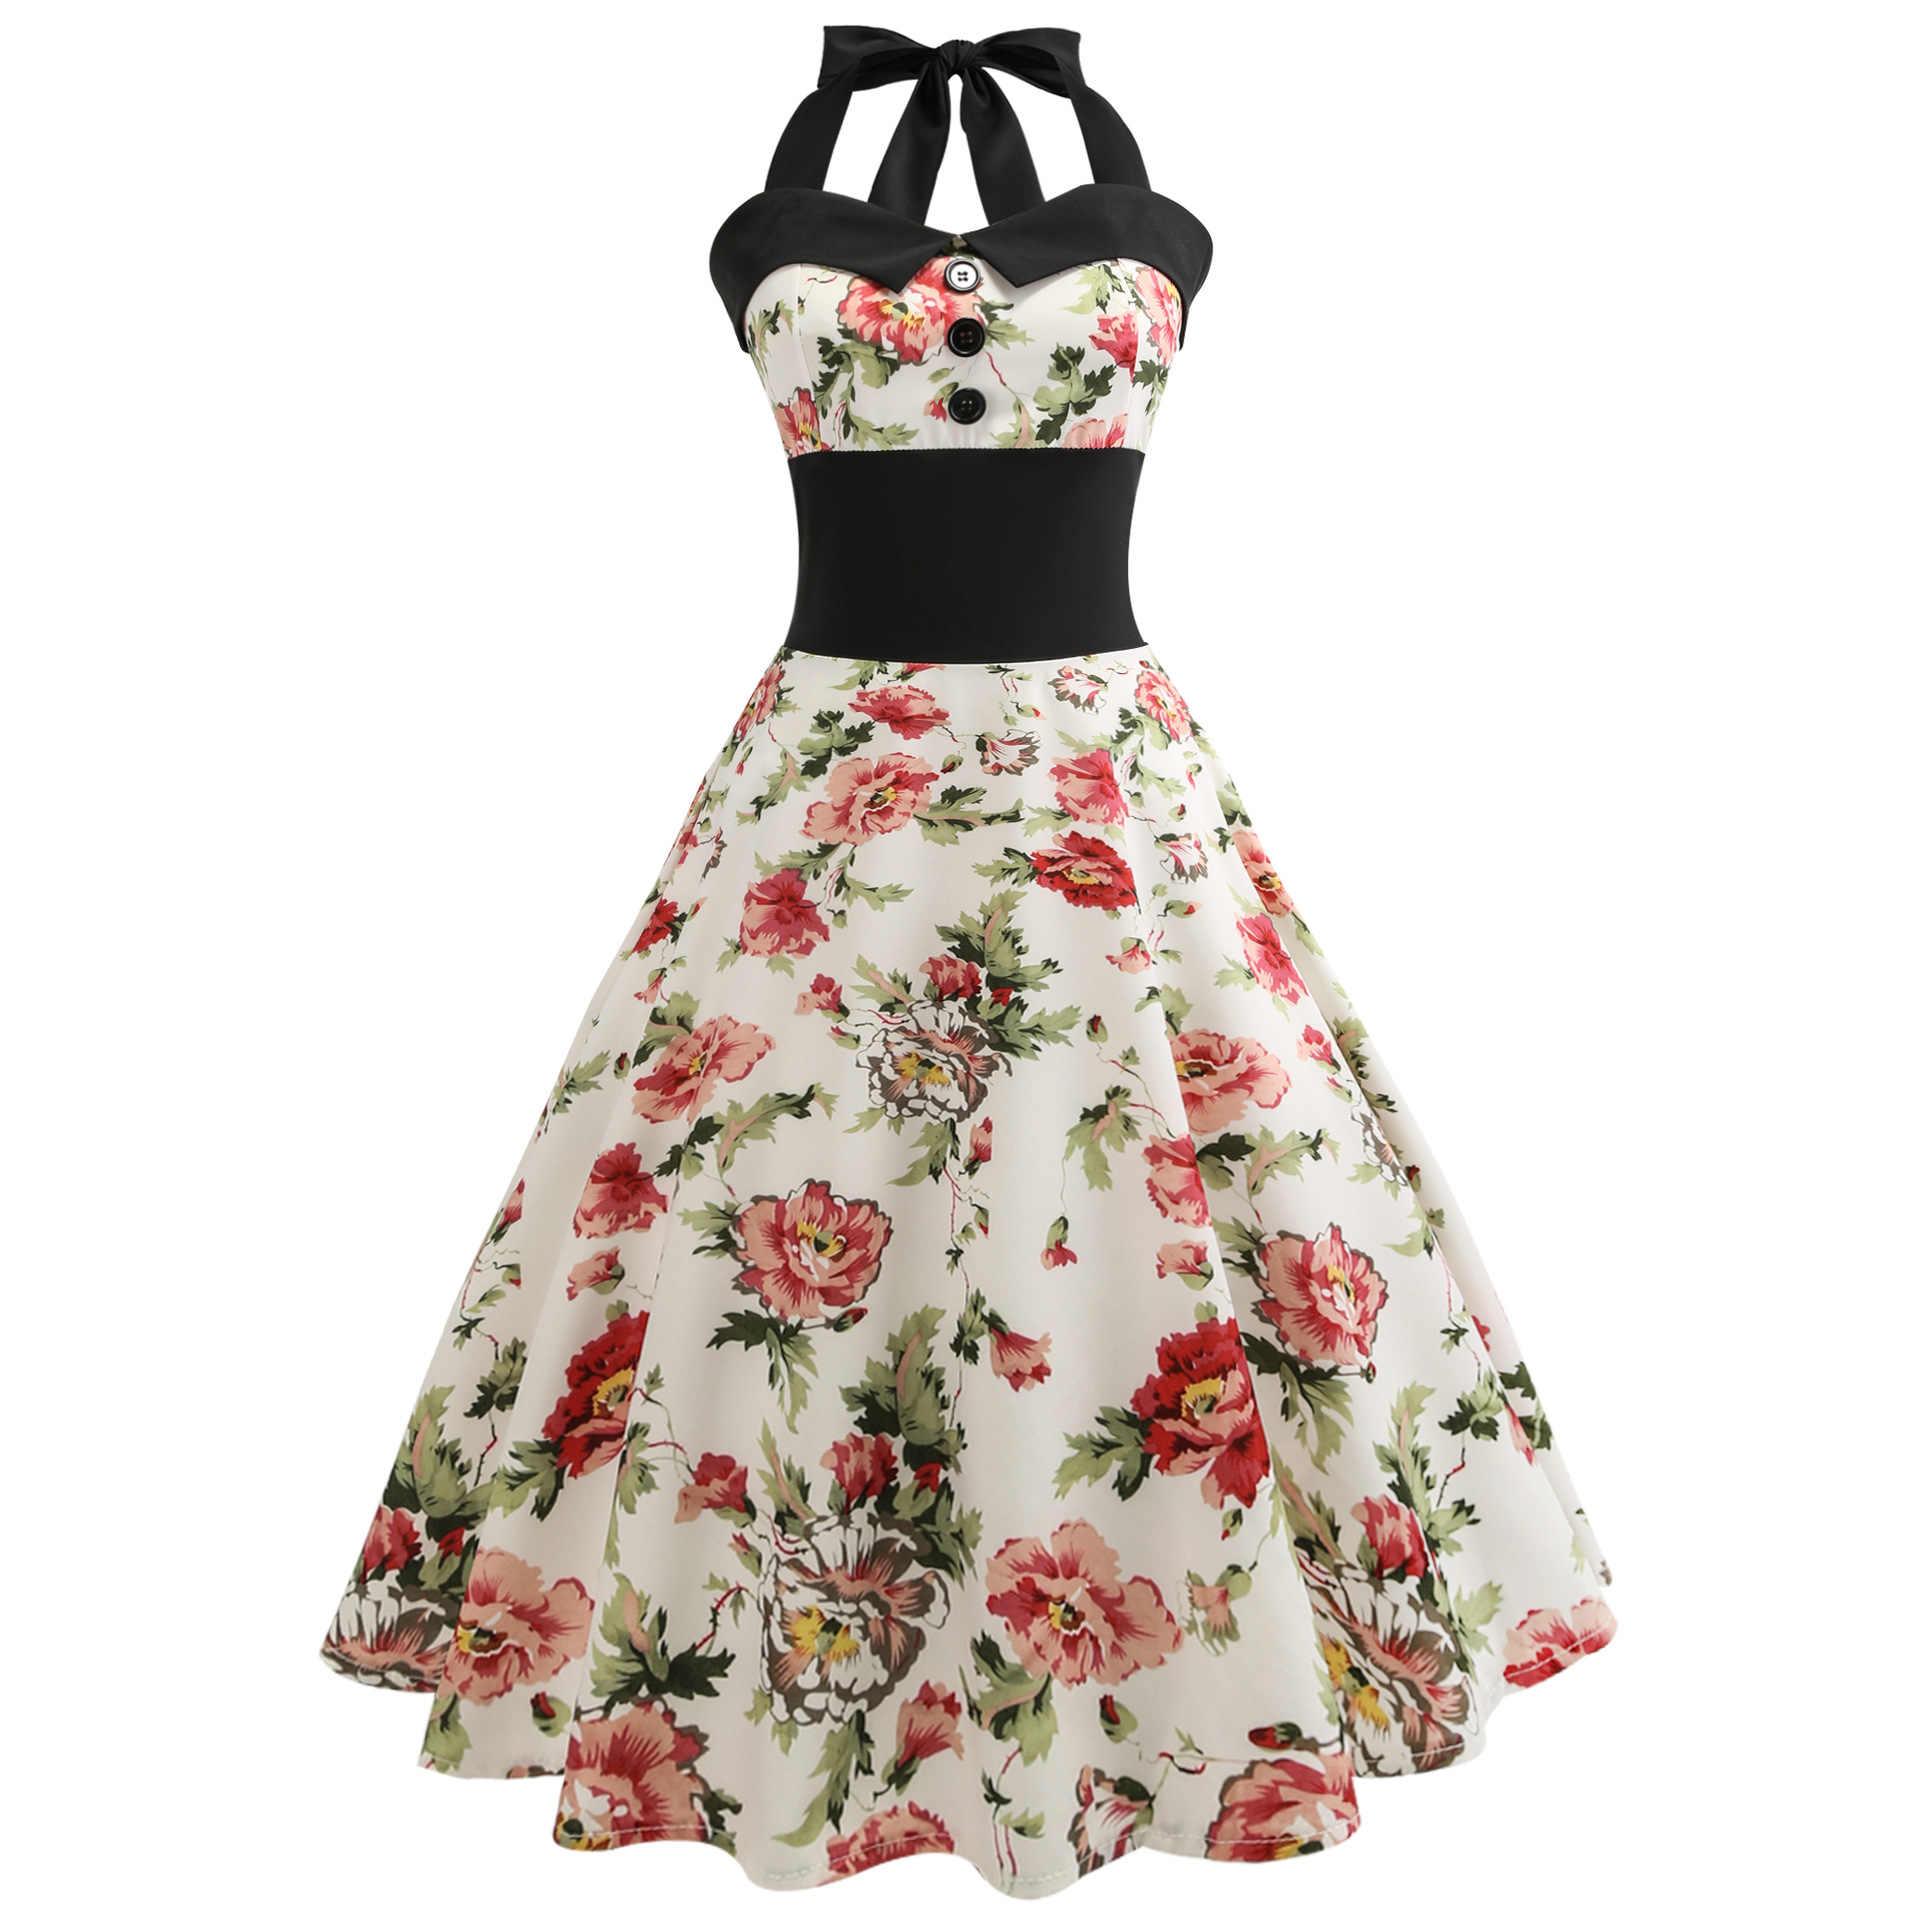 5c793cc0b1c6b Summer Dress 2019 Casual Floral 50s 60s Retro Vintage Dress Women Robe  Rockabilly Swing Pinup Vestido Sexy Elegant Party Dresses